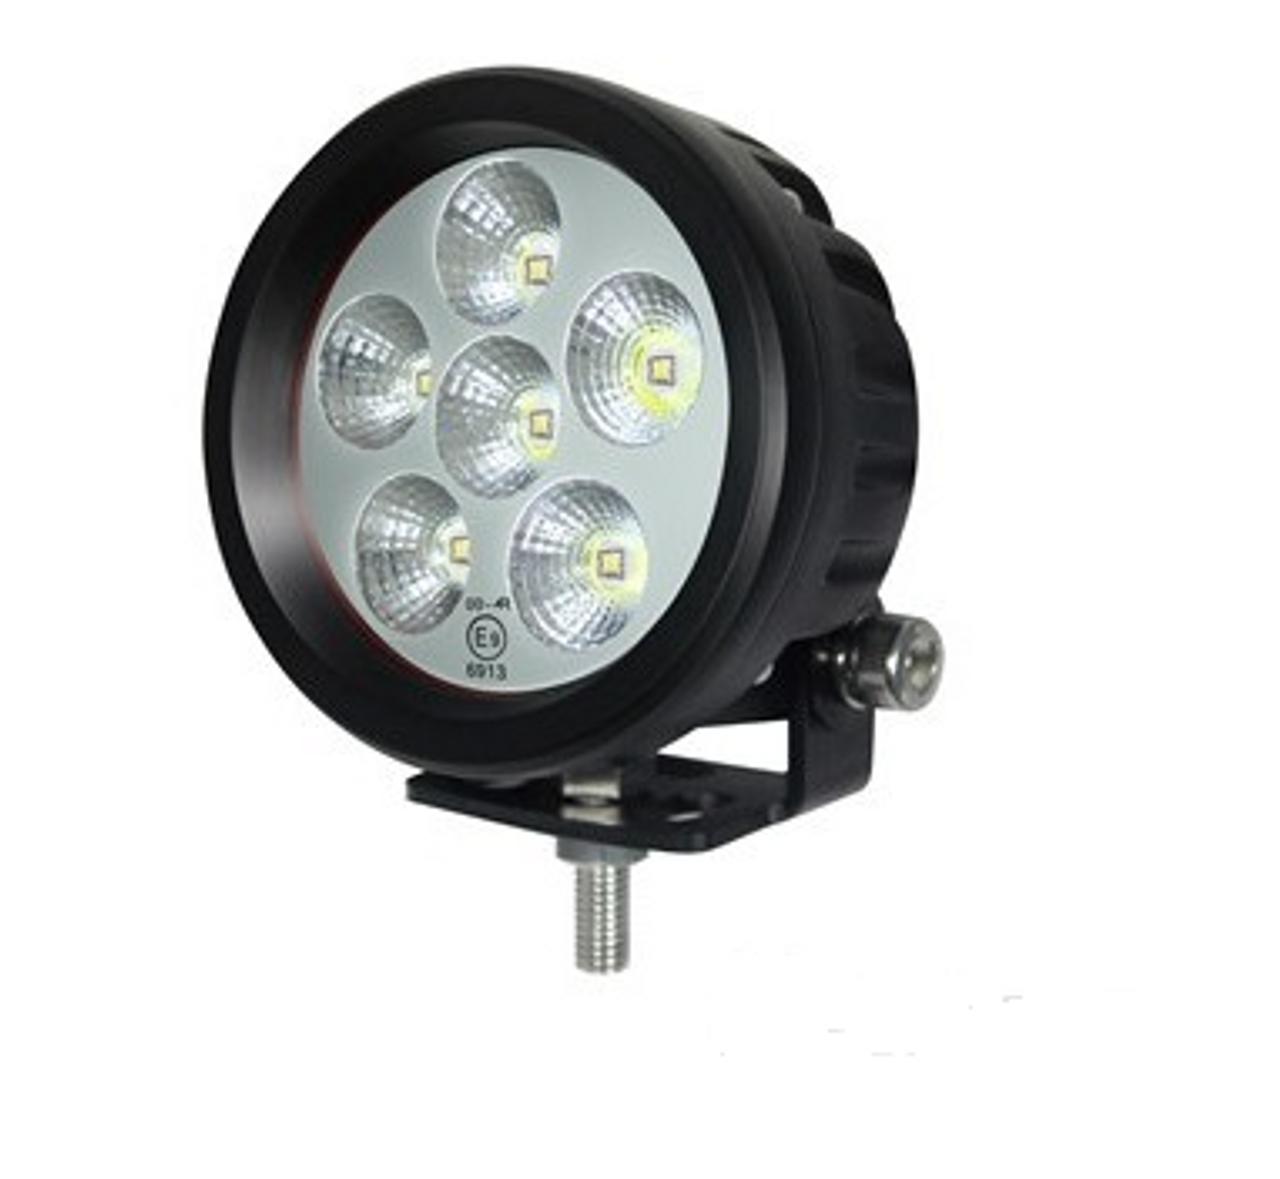 RWL9518F - 90 mm Round LED Flood Work Light. 18 Watt. Multi-Volt 10 to 30 Volt DC. 5 Year Warranty. RoadVision. RWL9518F.